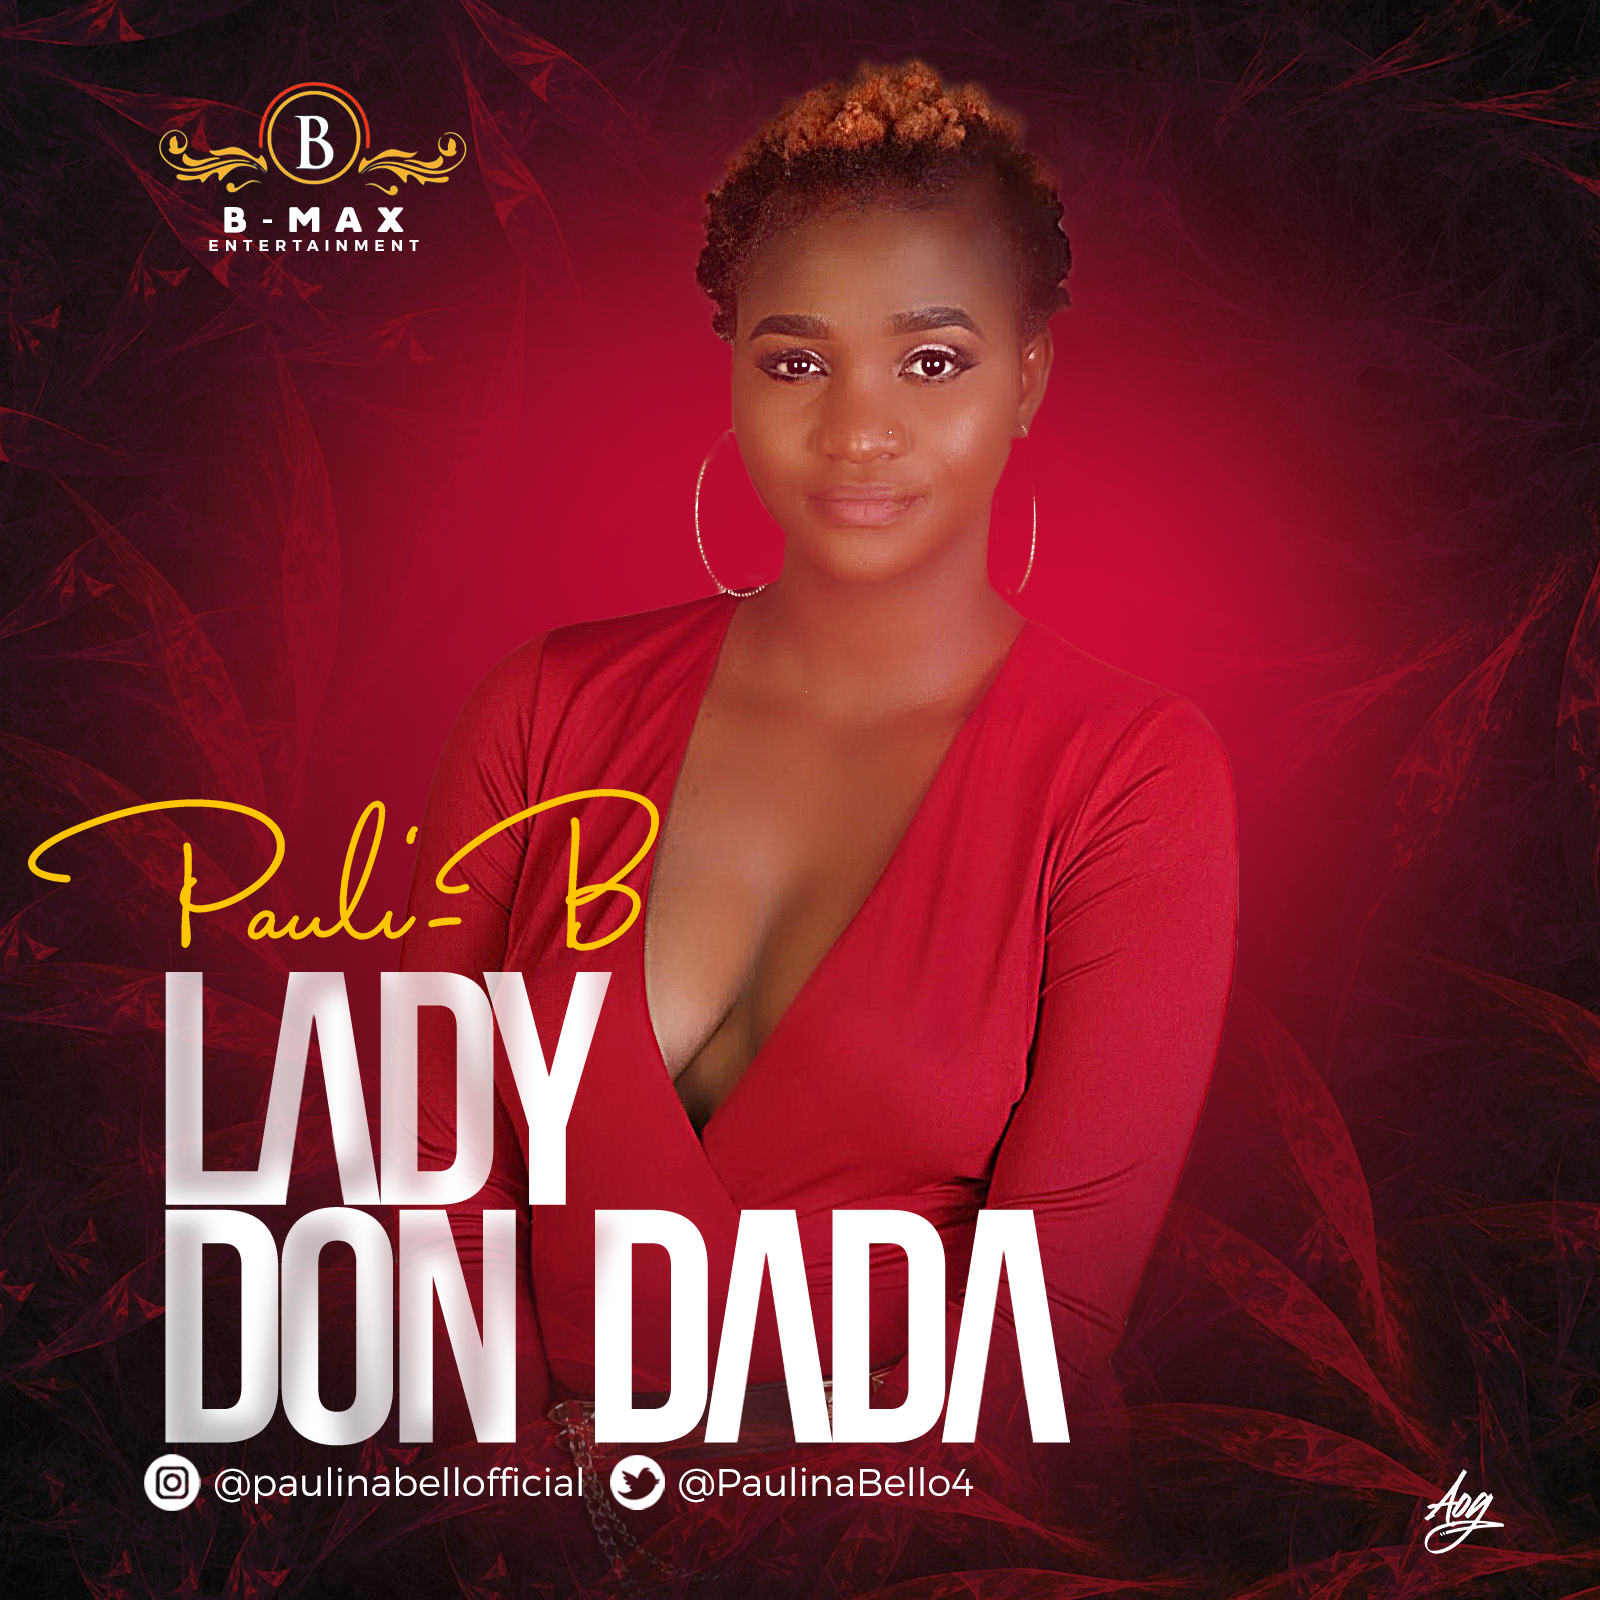 Pauli-B – Lady Don Dada